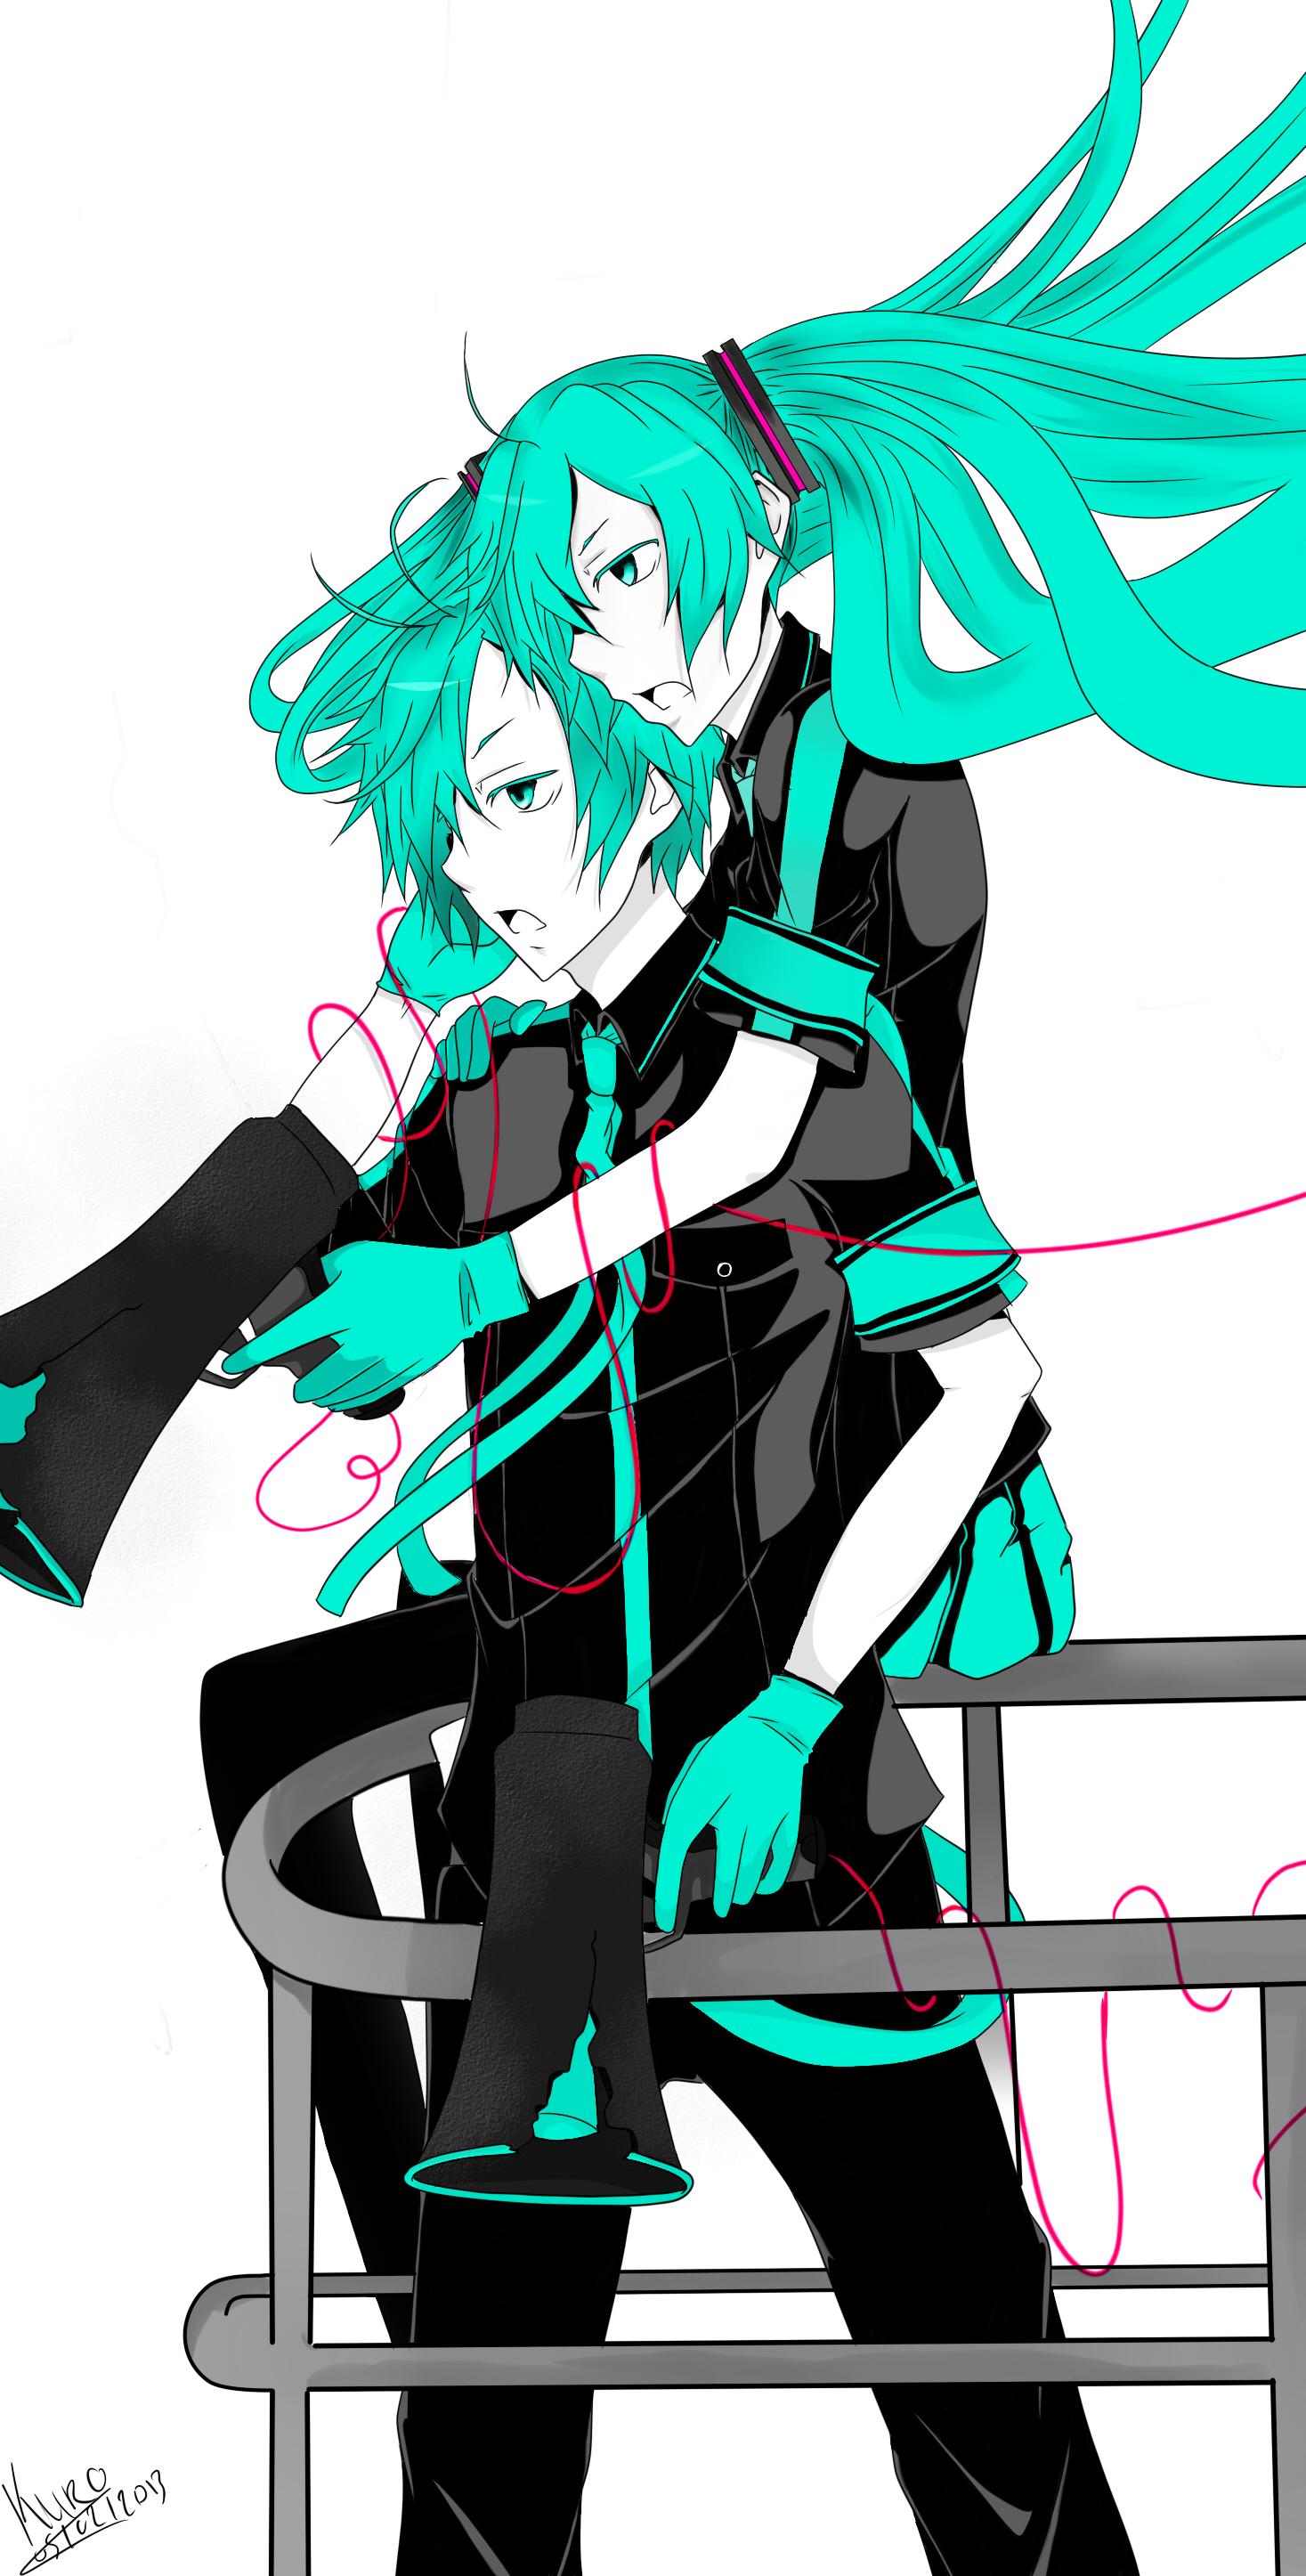 hatsune miku and hatsune mikuo love is war by